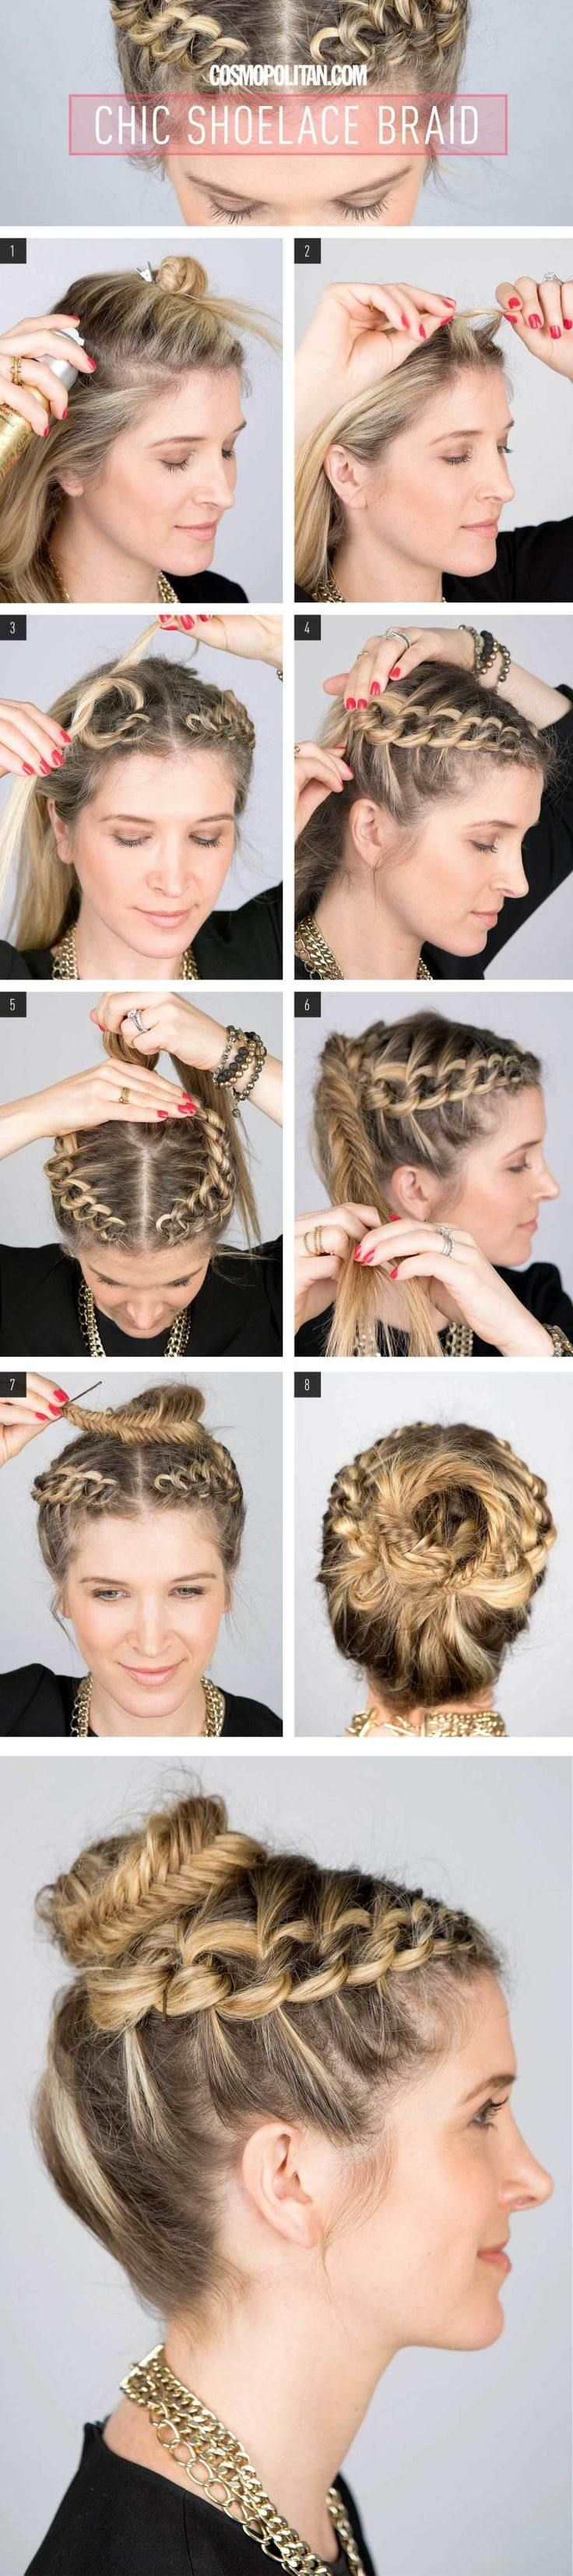 Tutorials: 12 Super Easy DIY Wedding Hairstyles